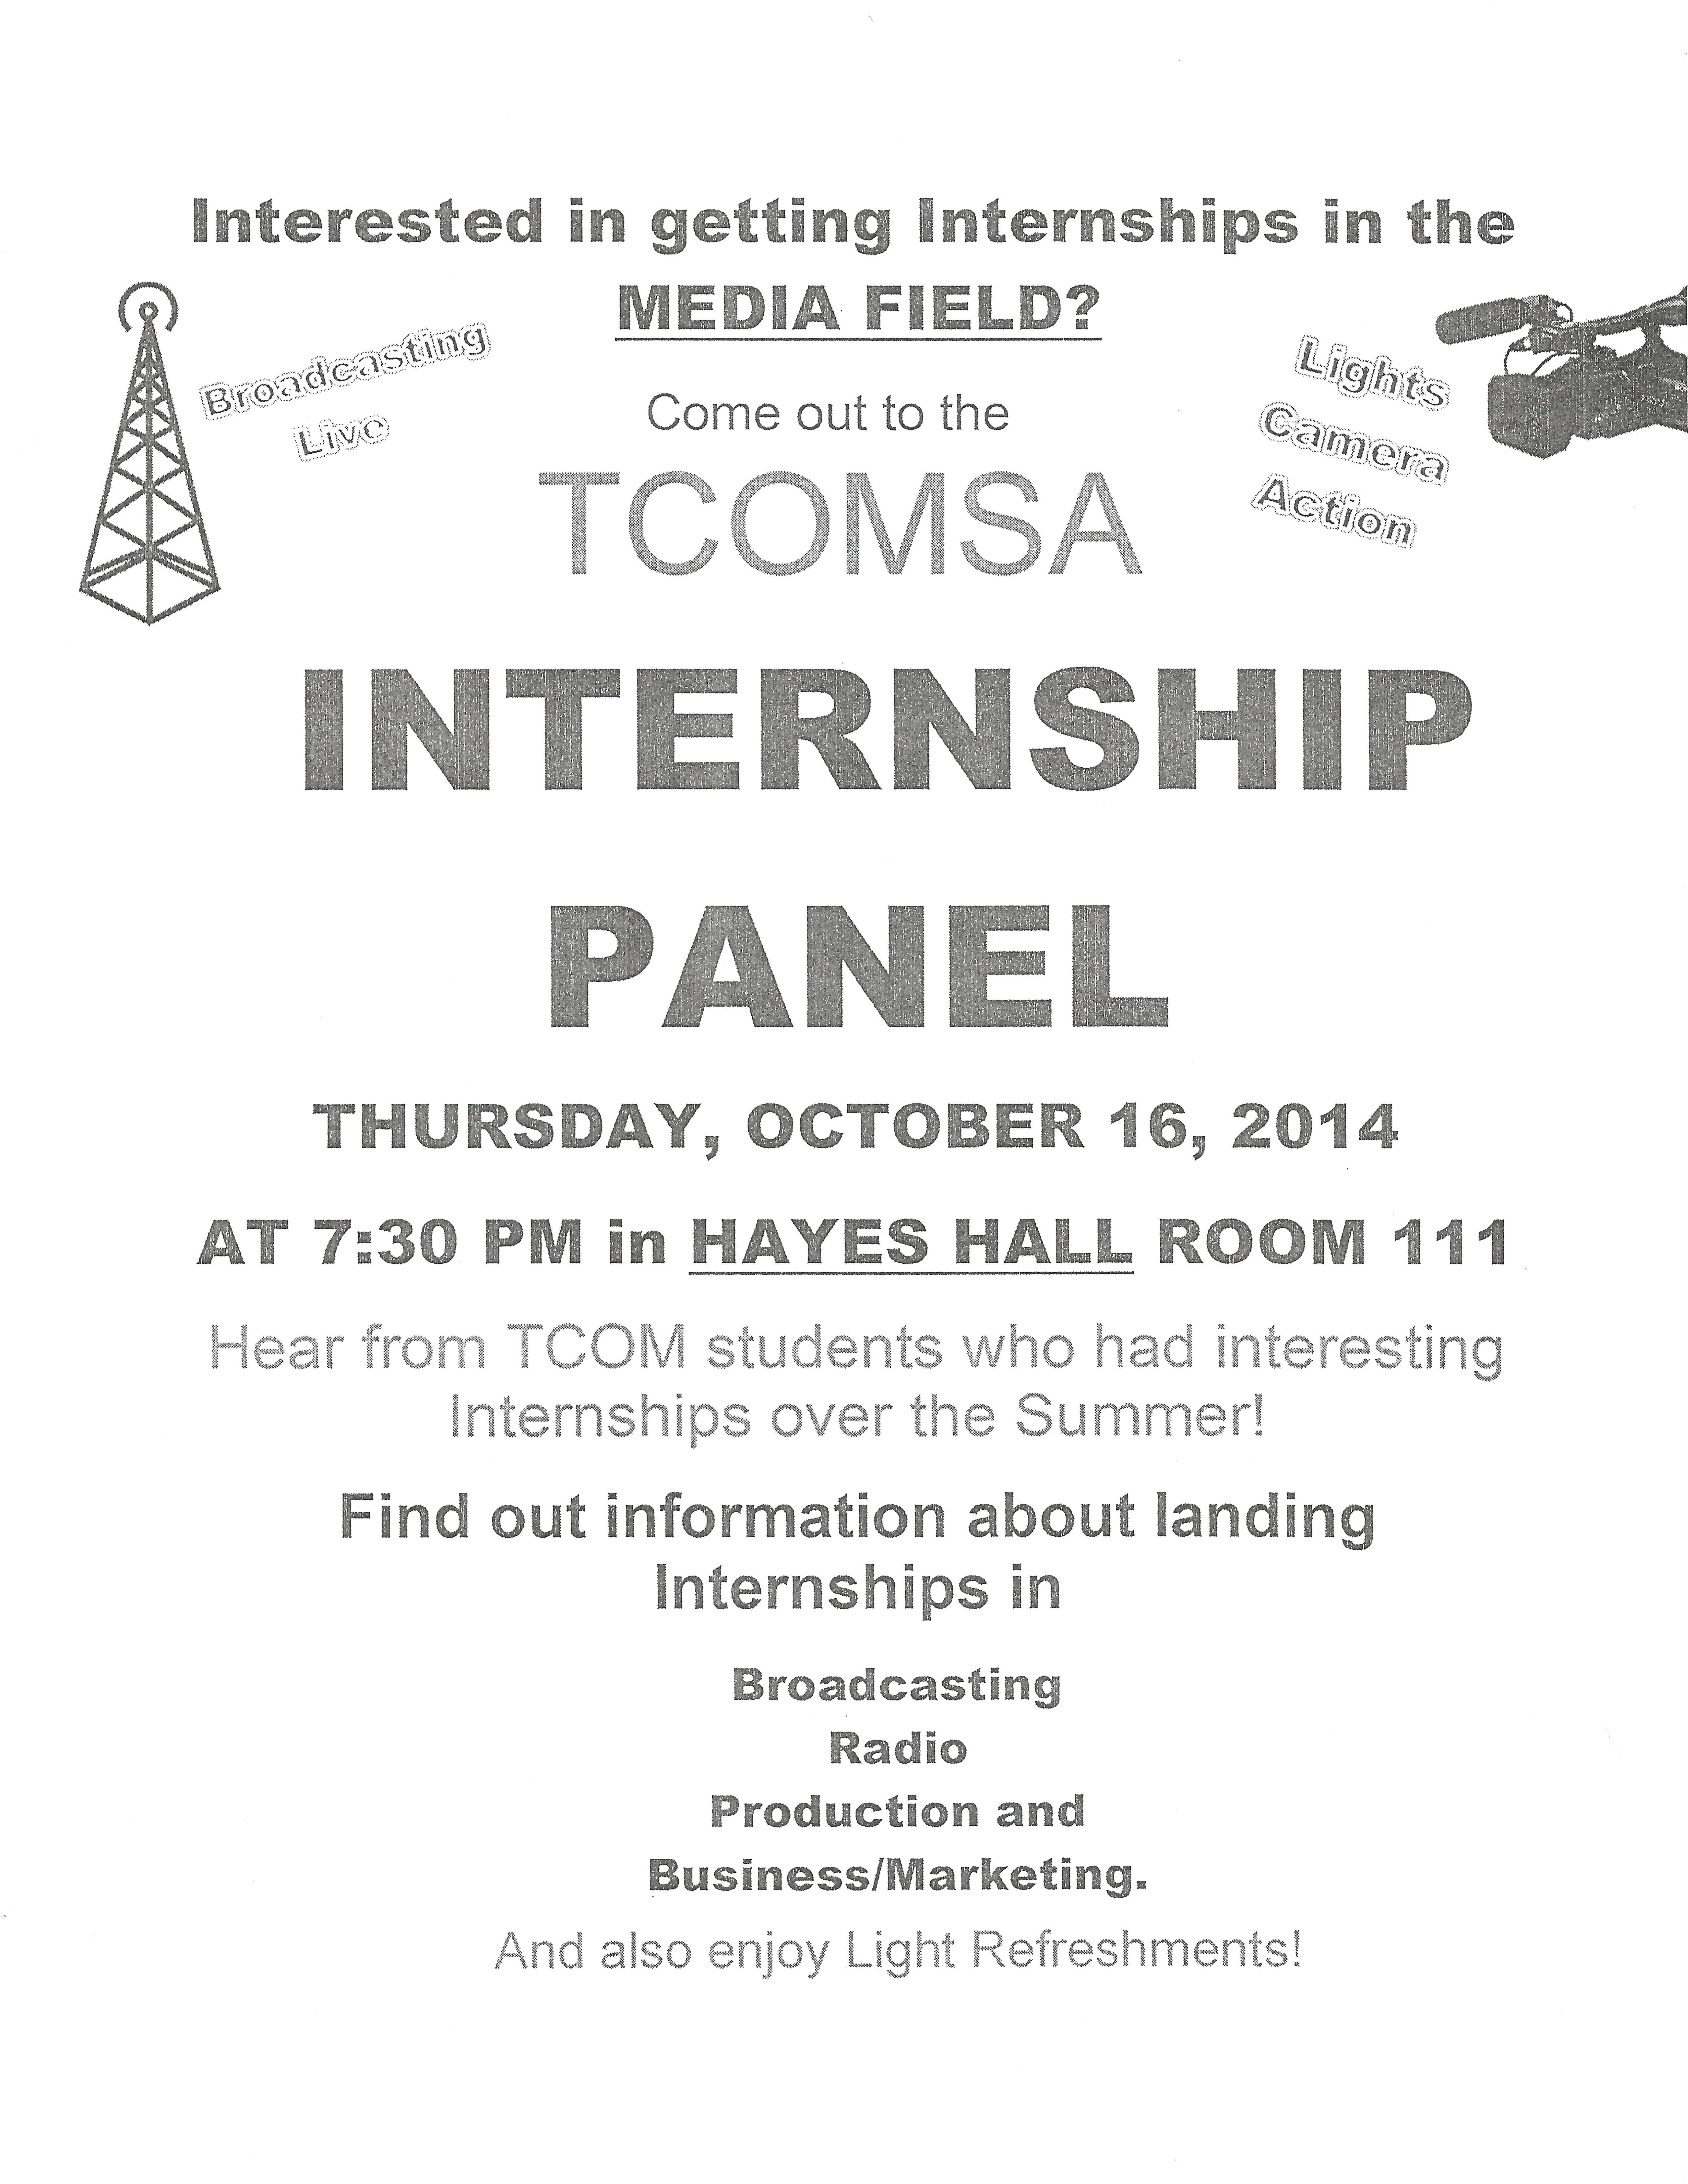 TCOM Internship Panel